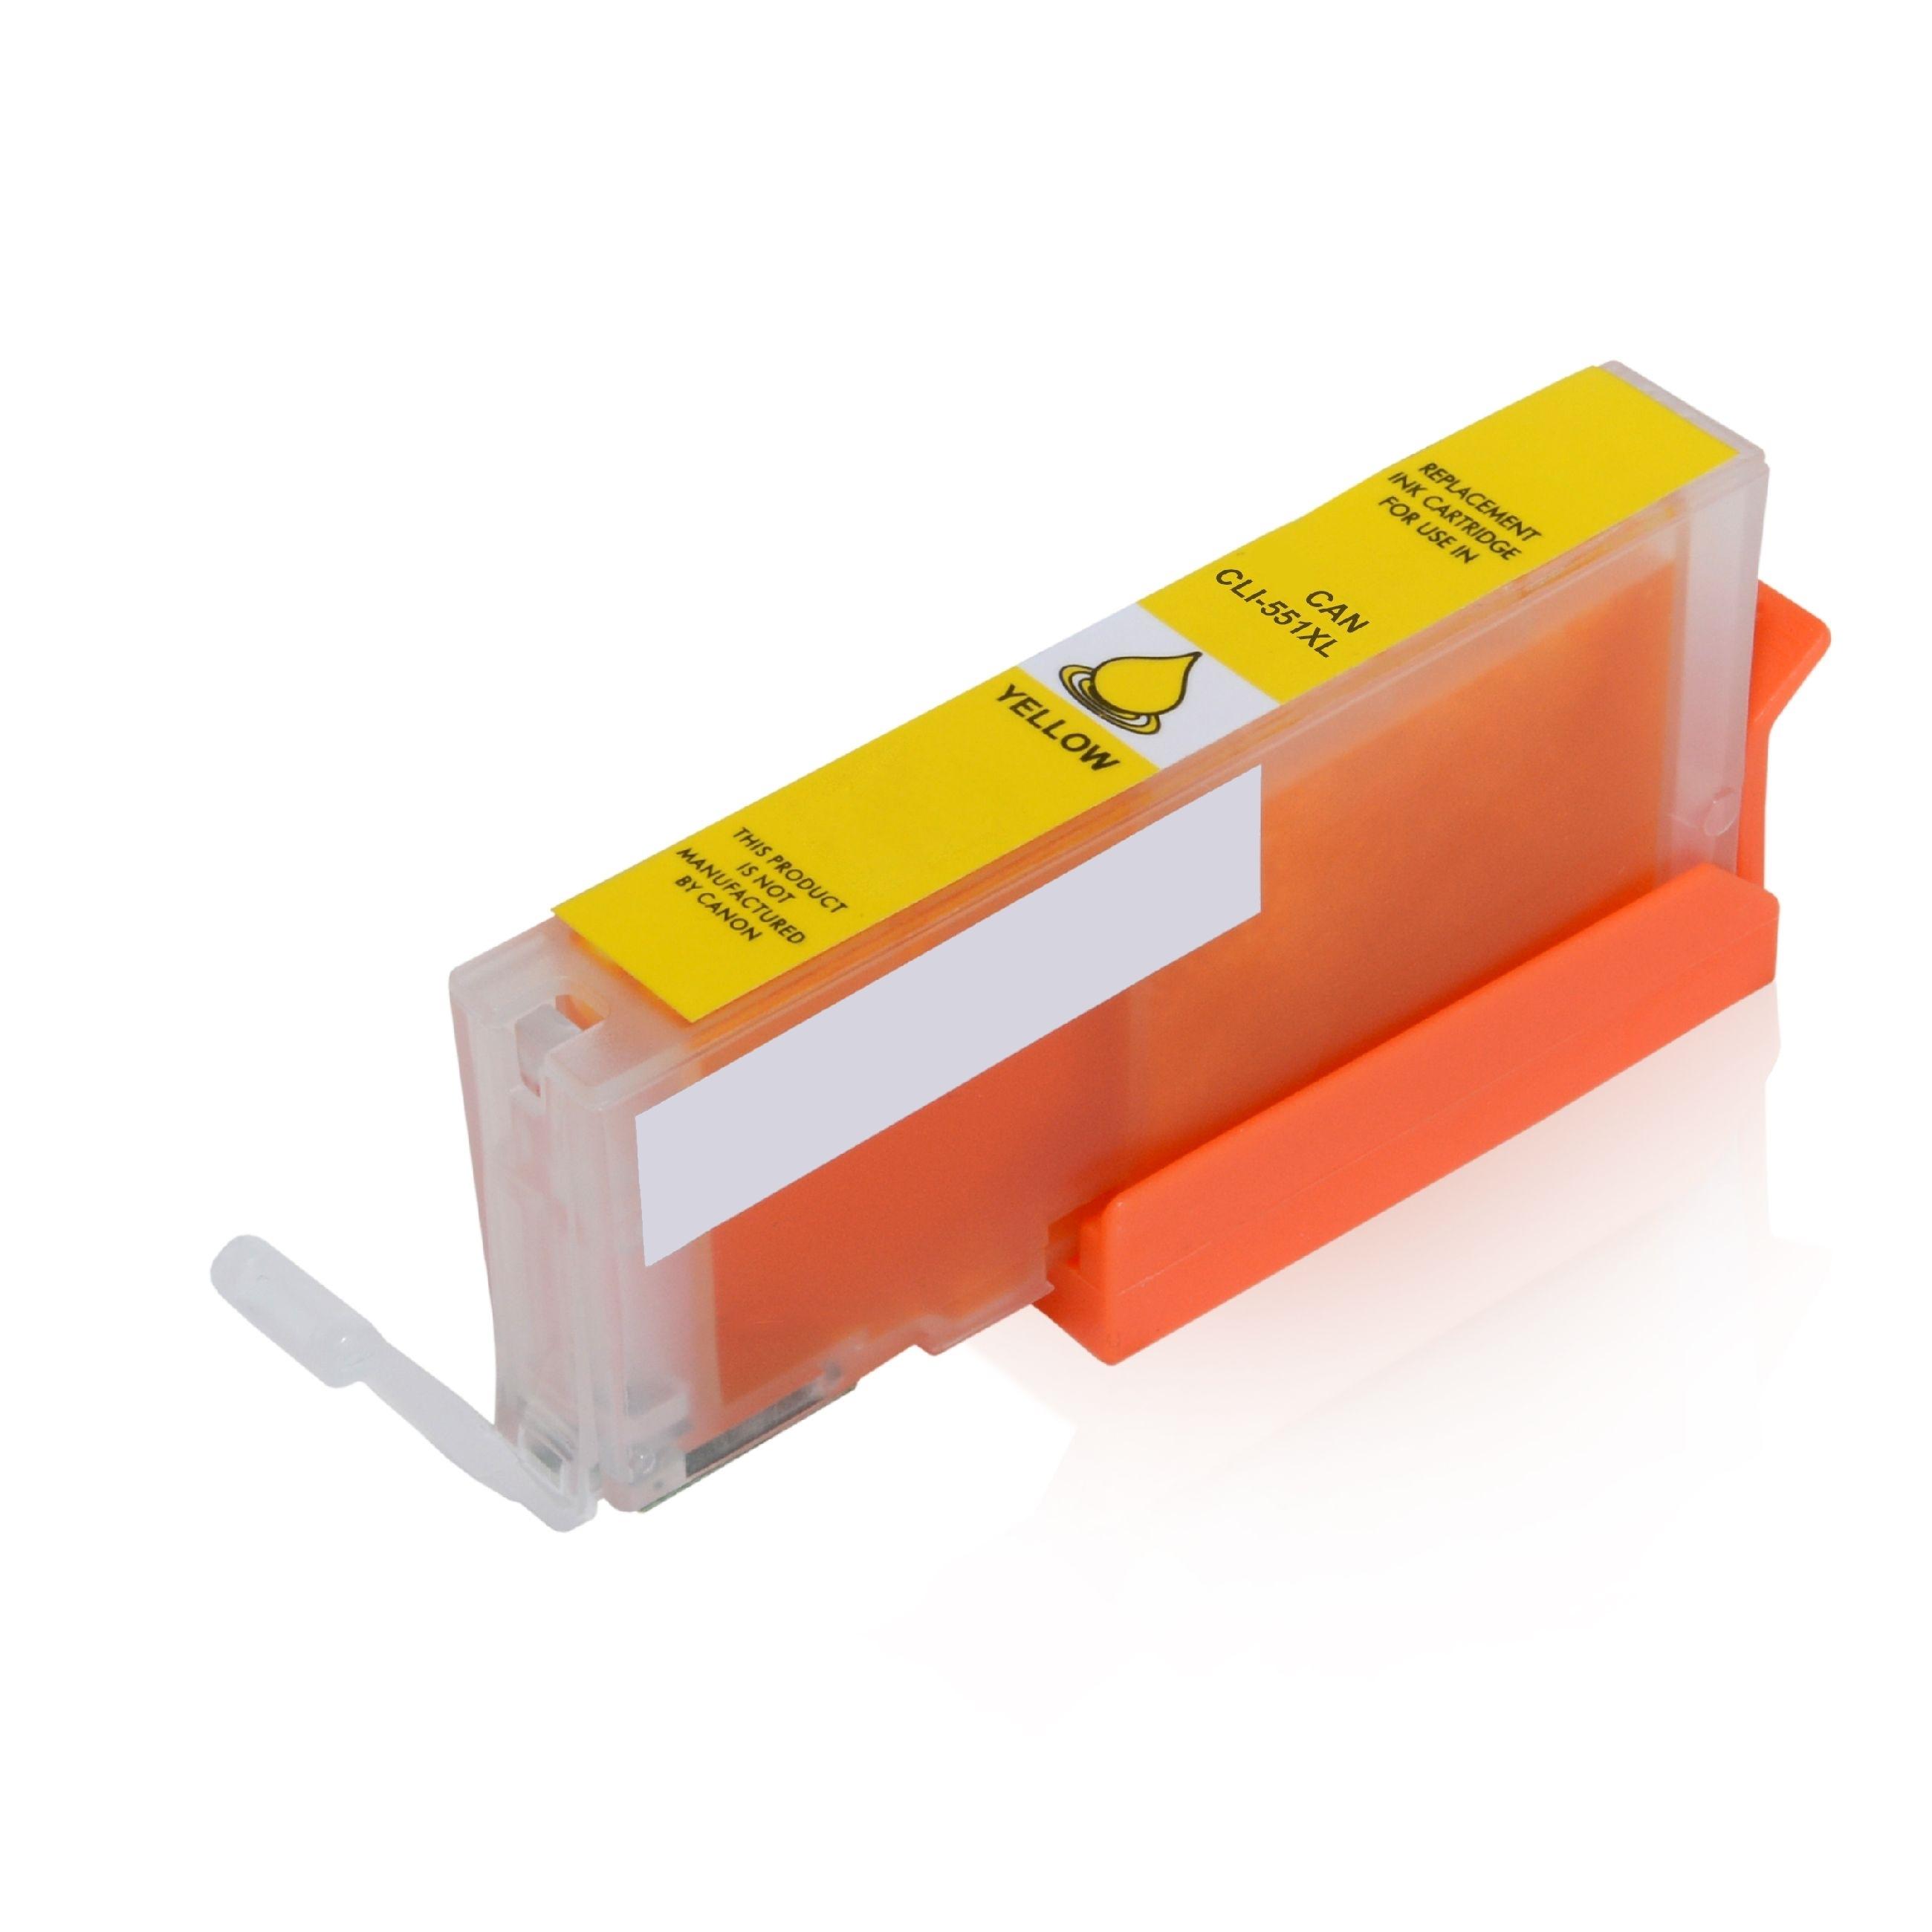 ASC-Premium-Tintenpatrone für Canon Pixma MG 5750 gelb Pixma MG 5750 PixmaMG5750